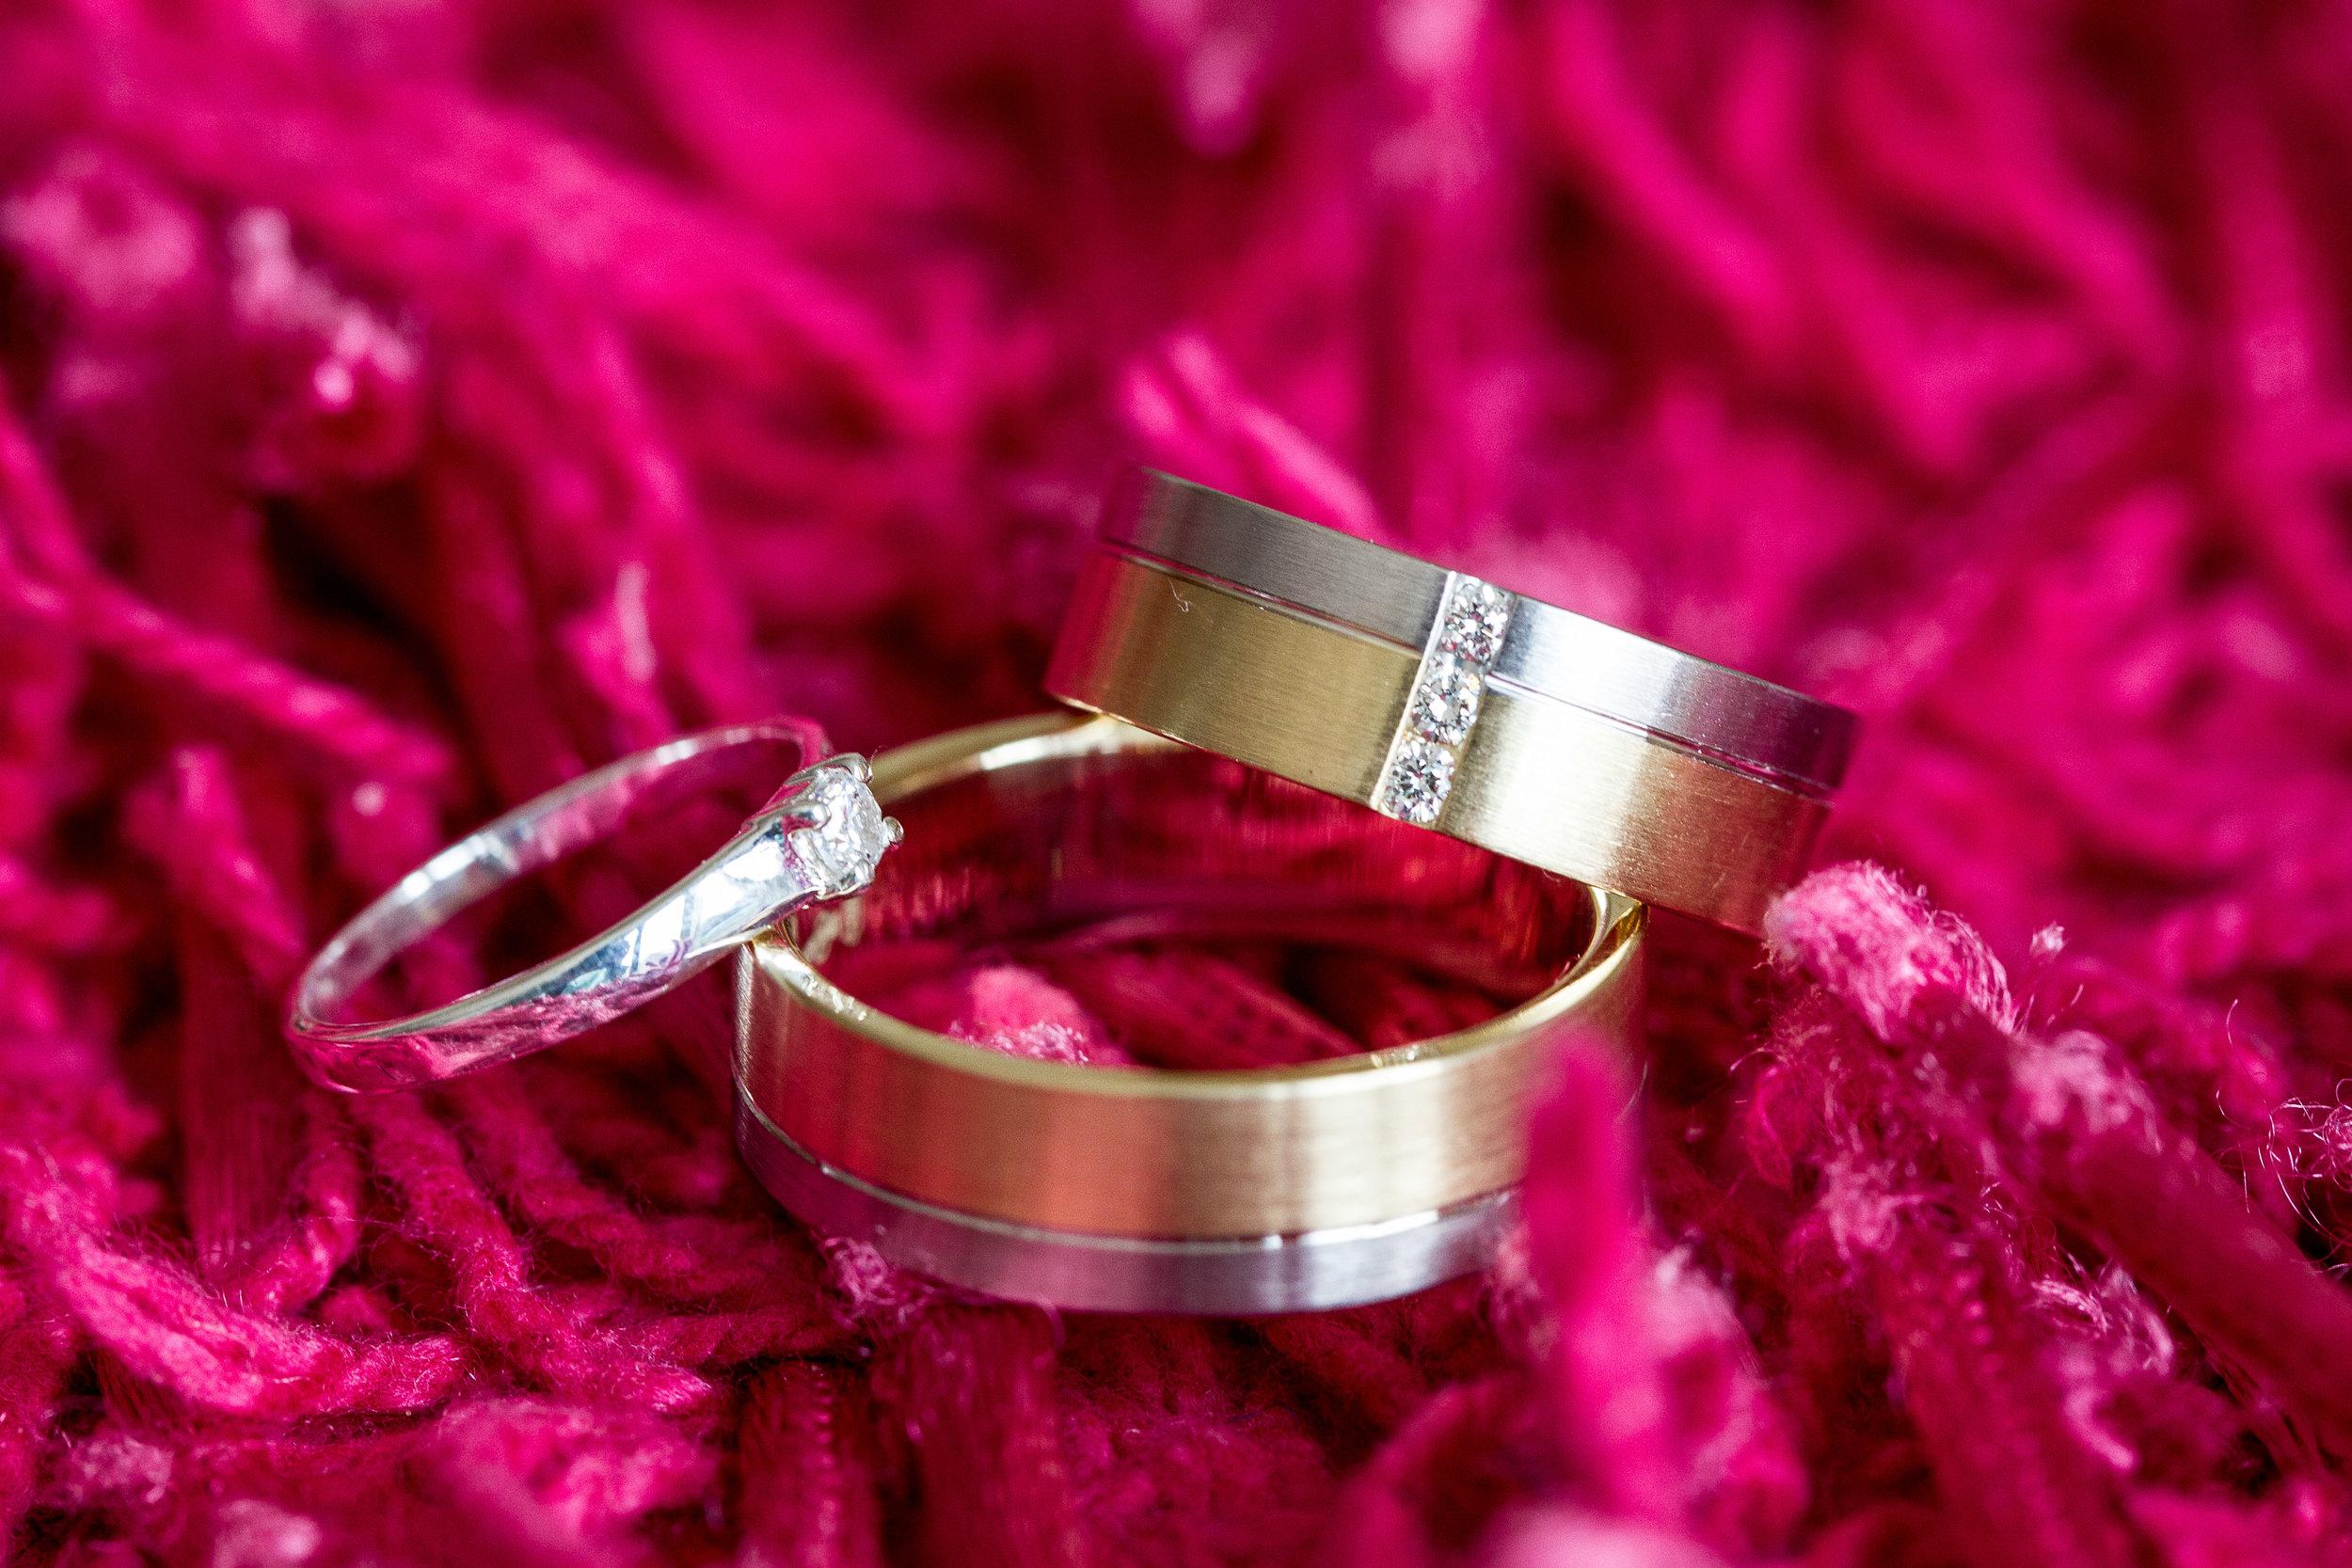 bruidsfotografie-trouwreportage-huwelijksfotografie-bruidsfotograaf-feestfotografie-Anouk en Edgar-57.jpg